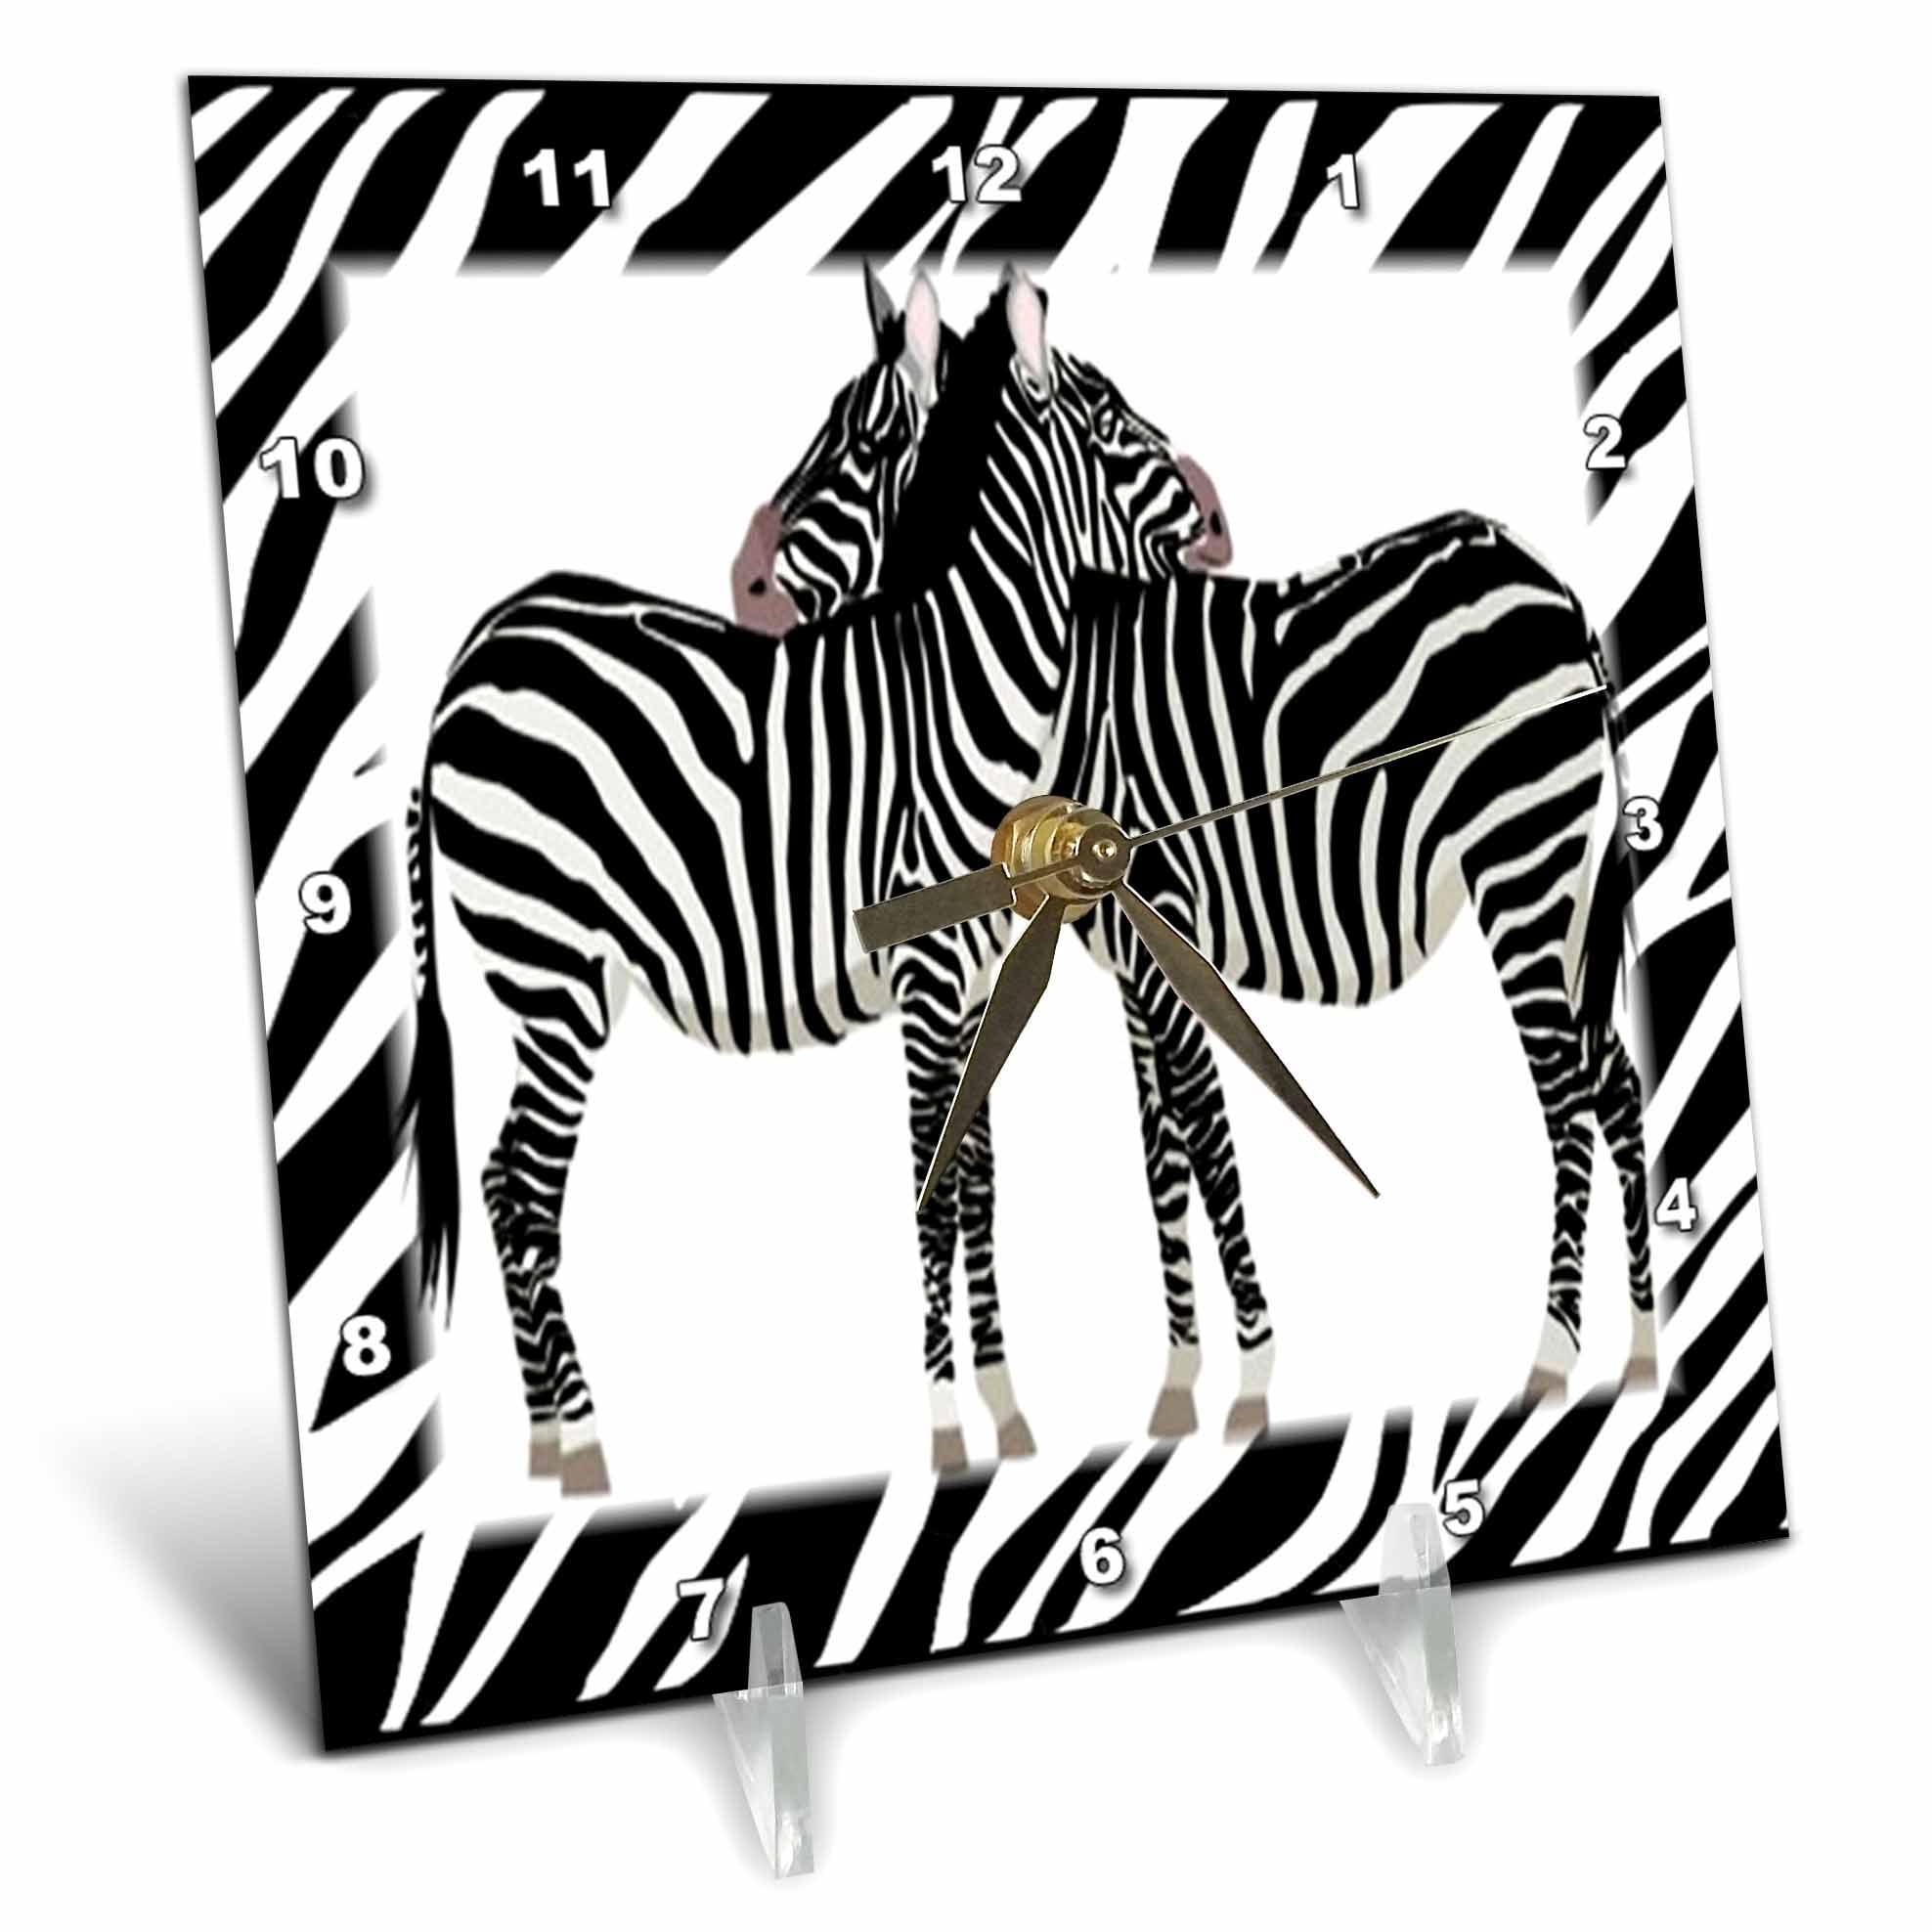 3dRose 2 Zebras Hug With Zebra Frame, Desk Clock, 6 by 6-inch by 3dRose